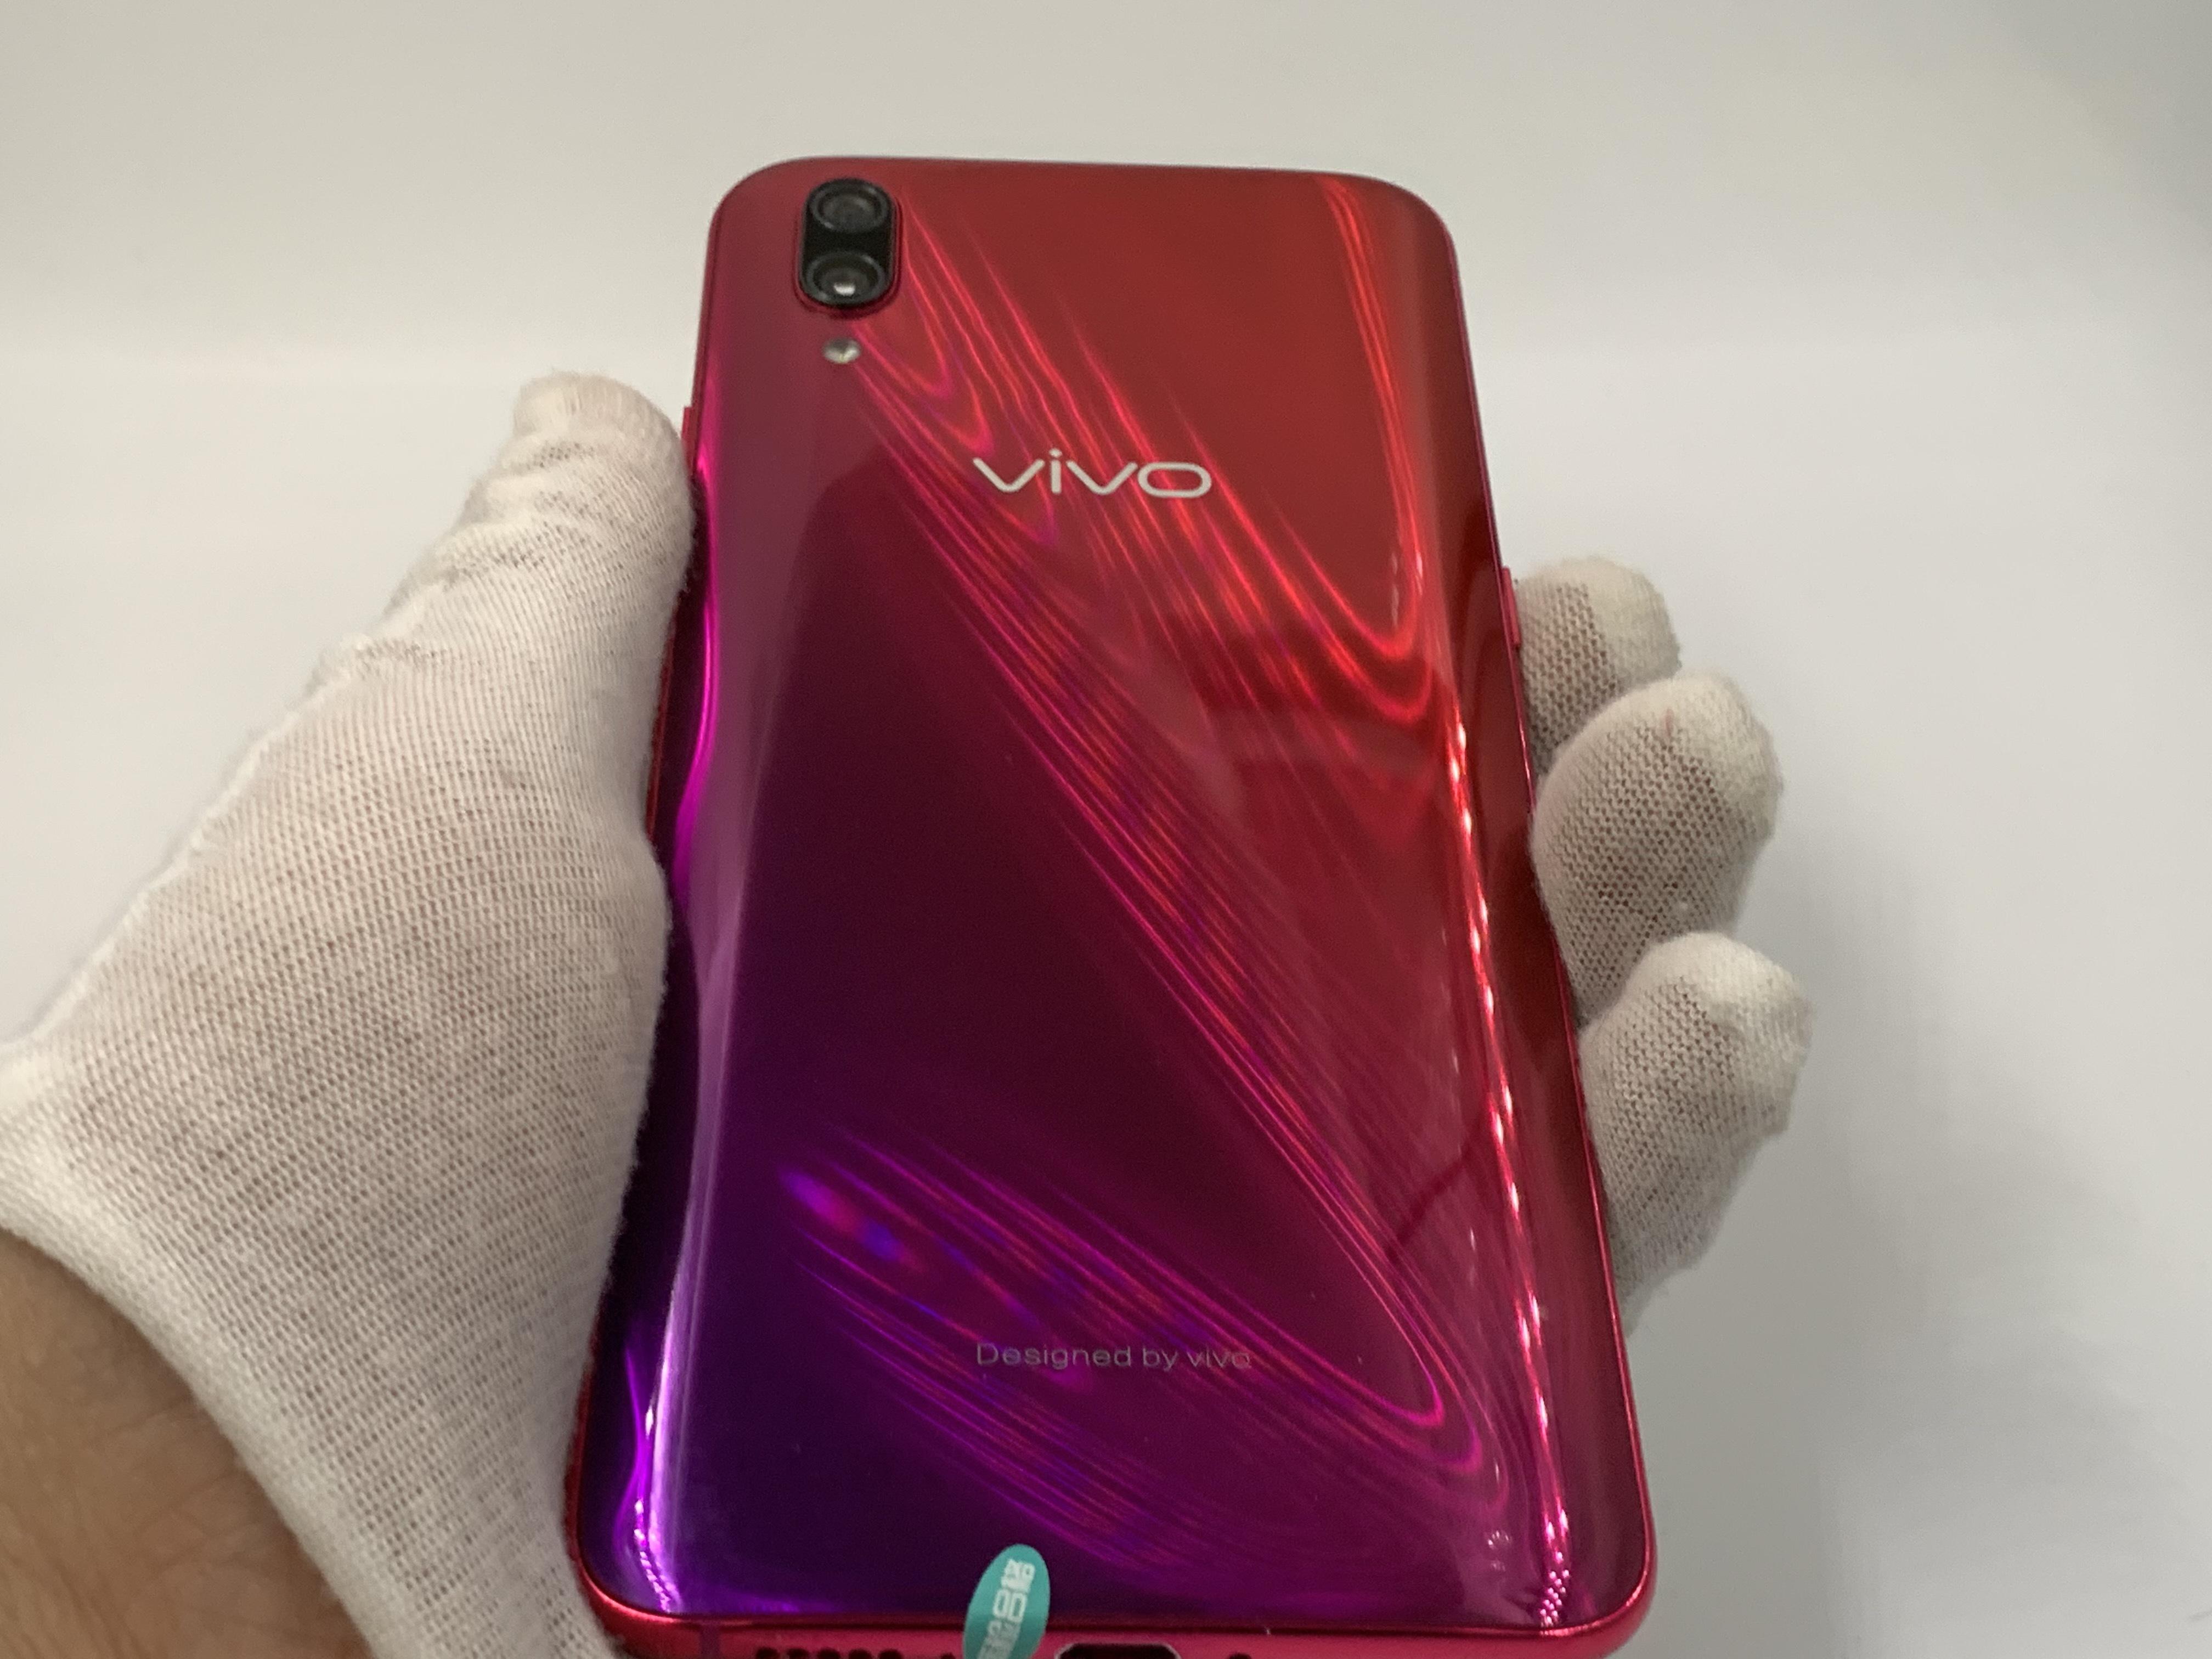 vivo【X23】4G全网通 红色 8G/128G 国行 9成新